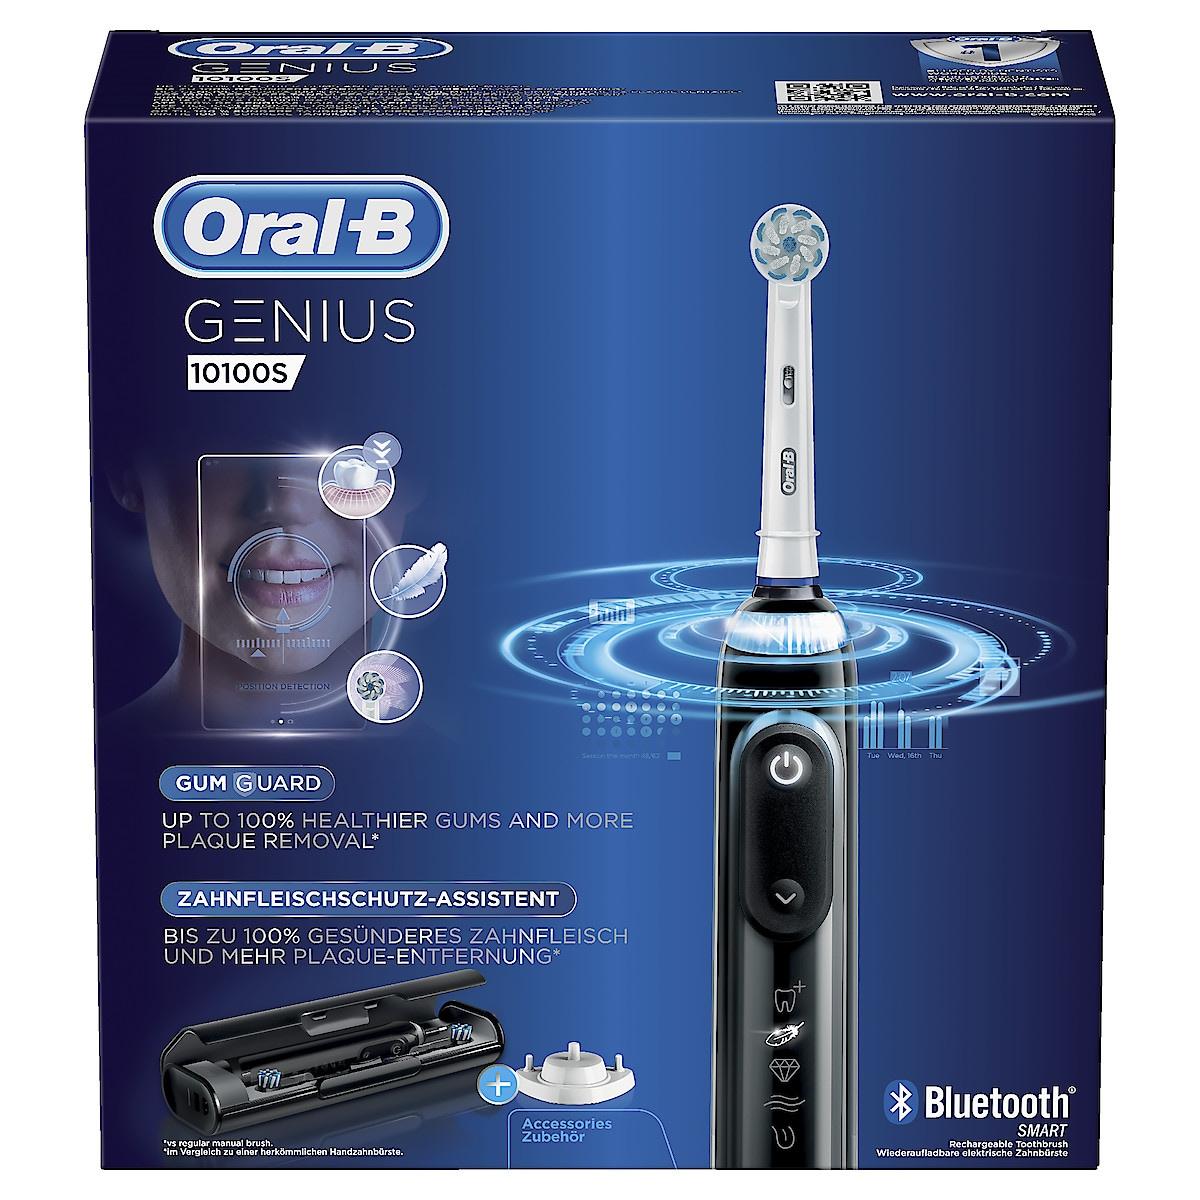 Oral-B Genius 10100S Black, eltannbørste